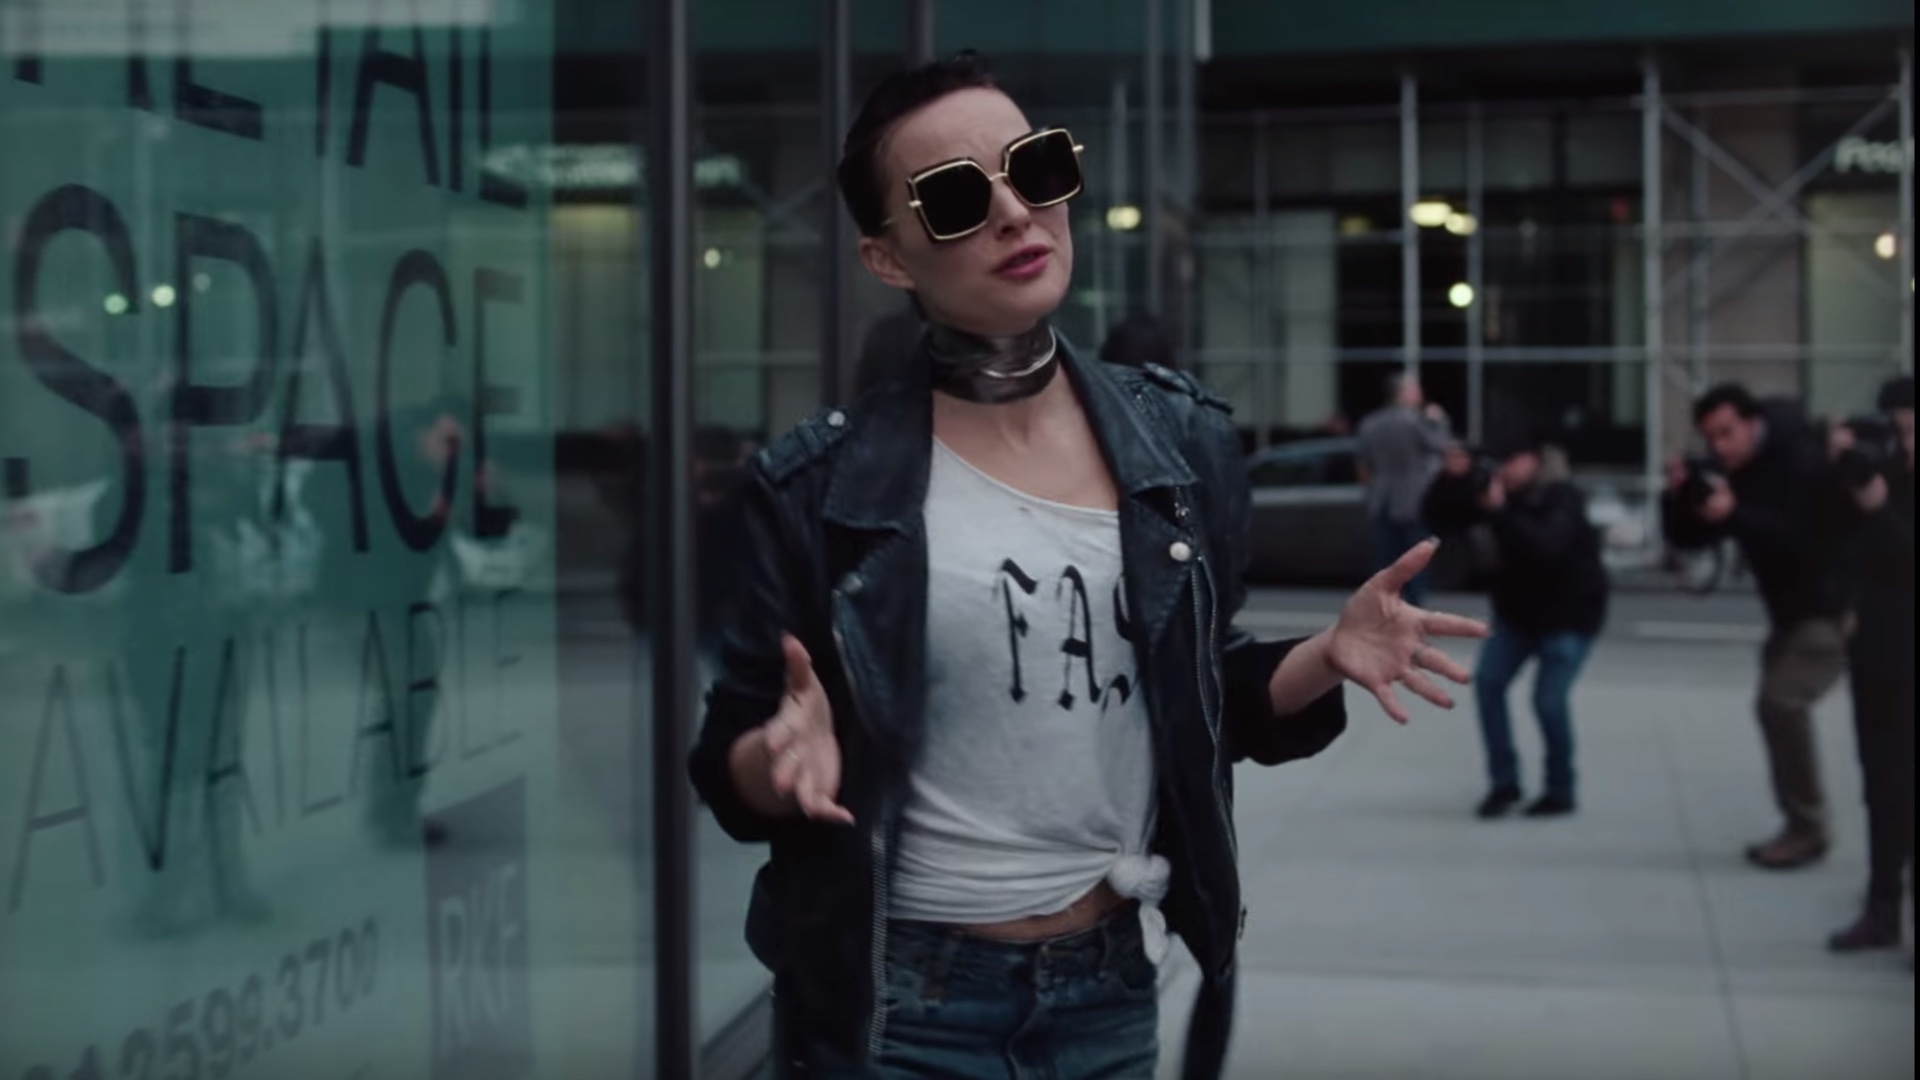 Witness Natalie Portmans Crazy Life as a Pop Star in Full Trailer 1920x1080